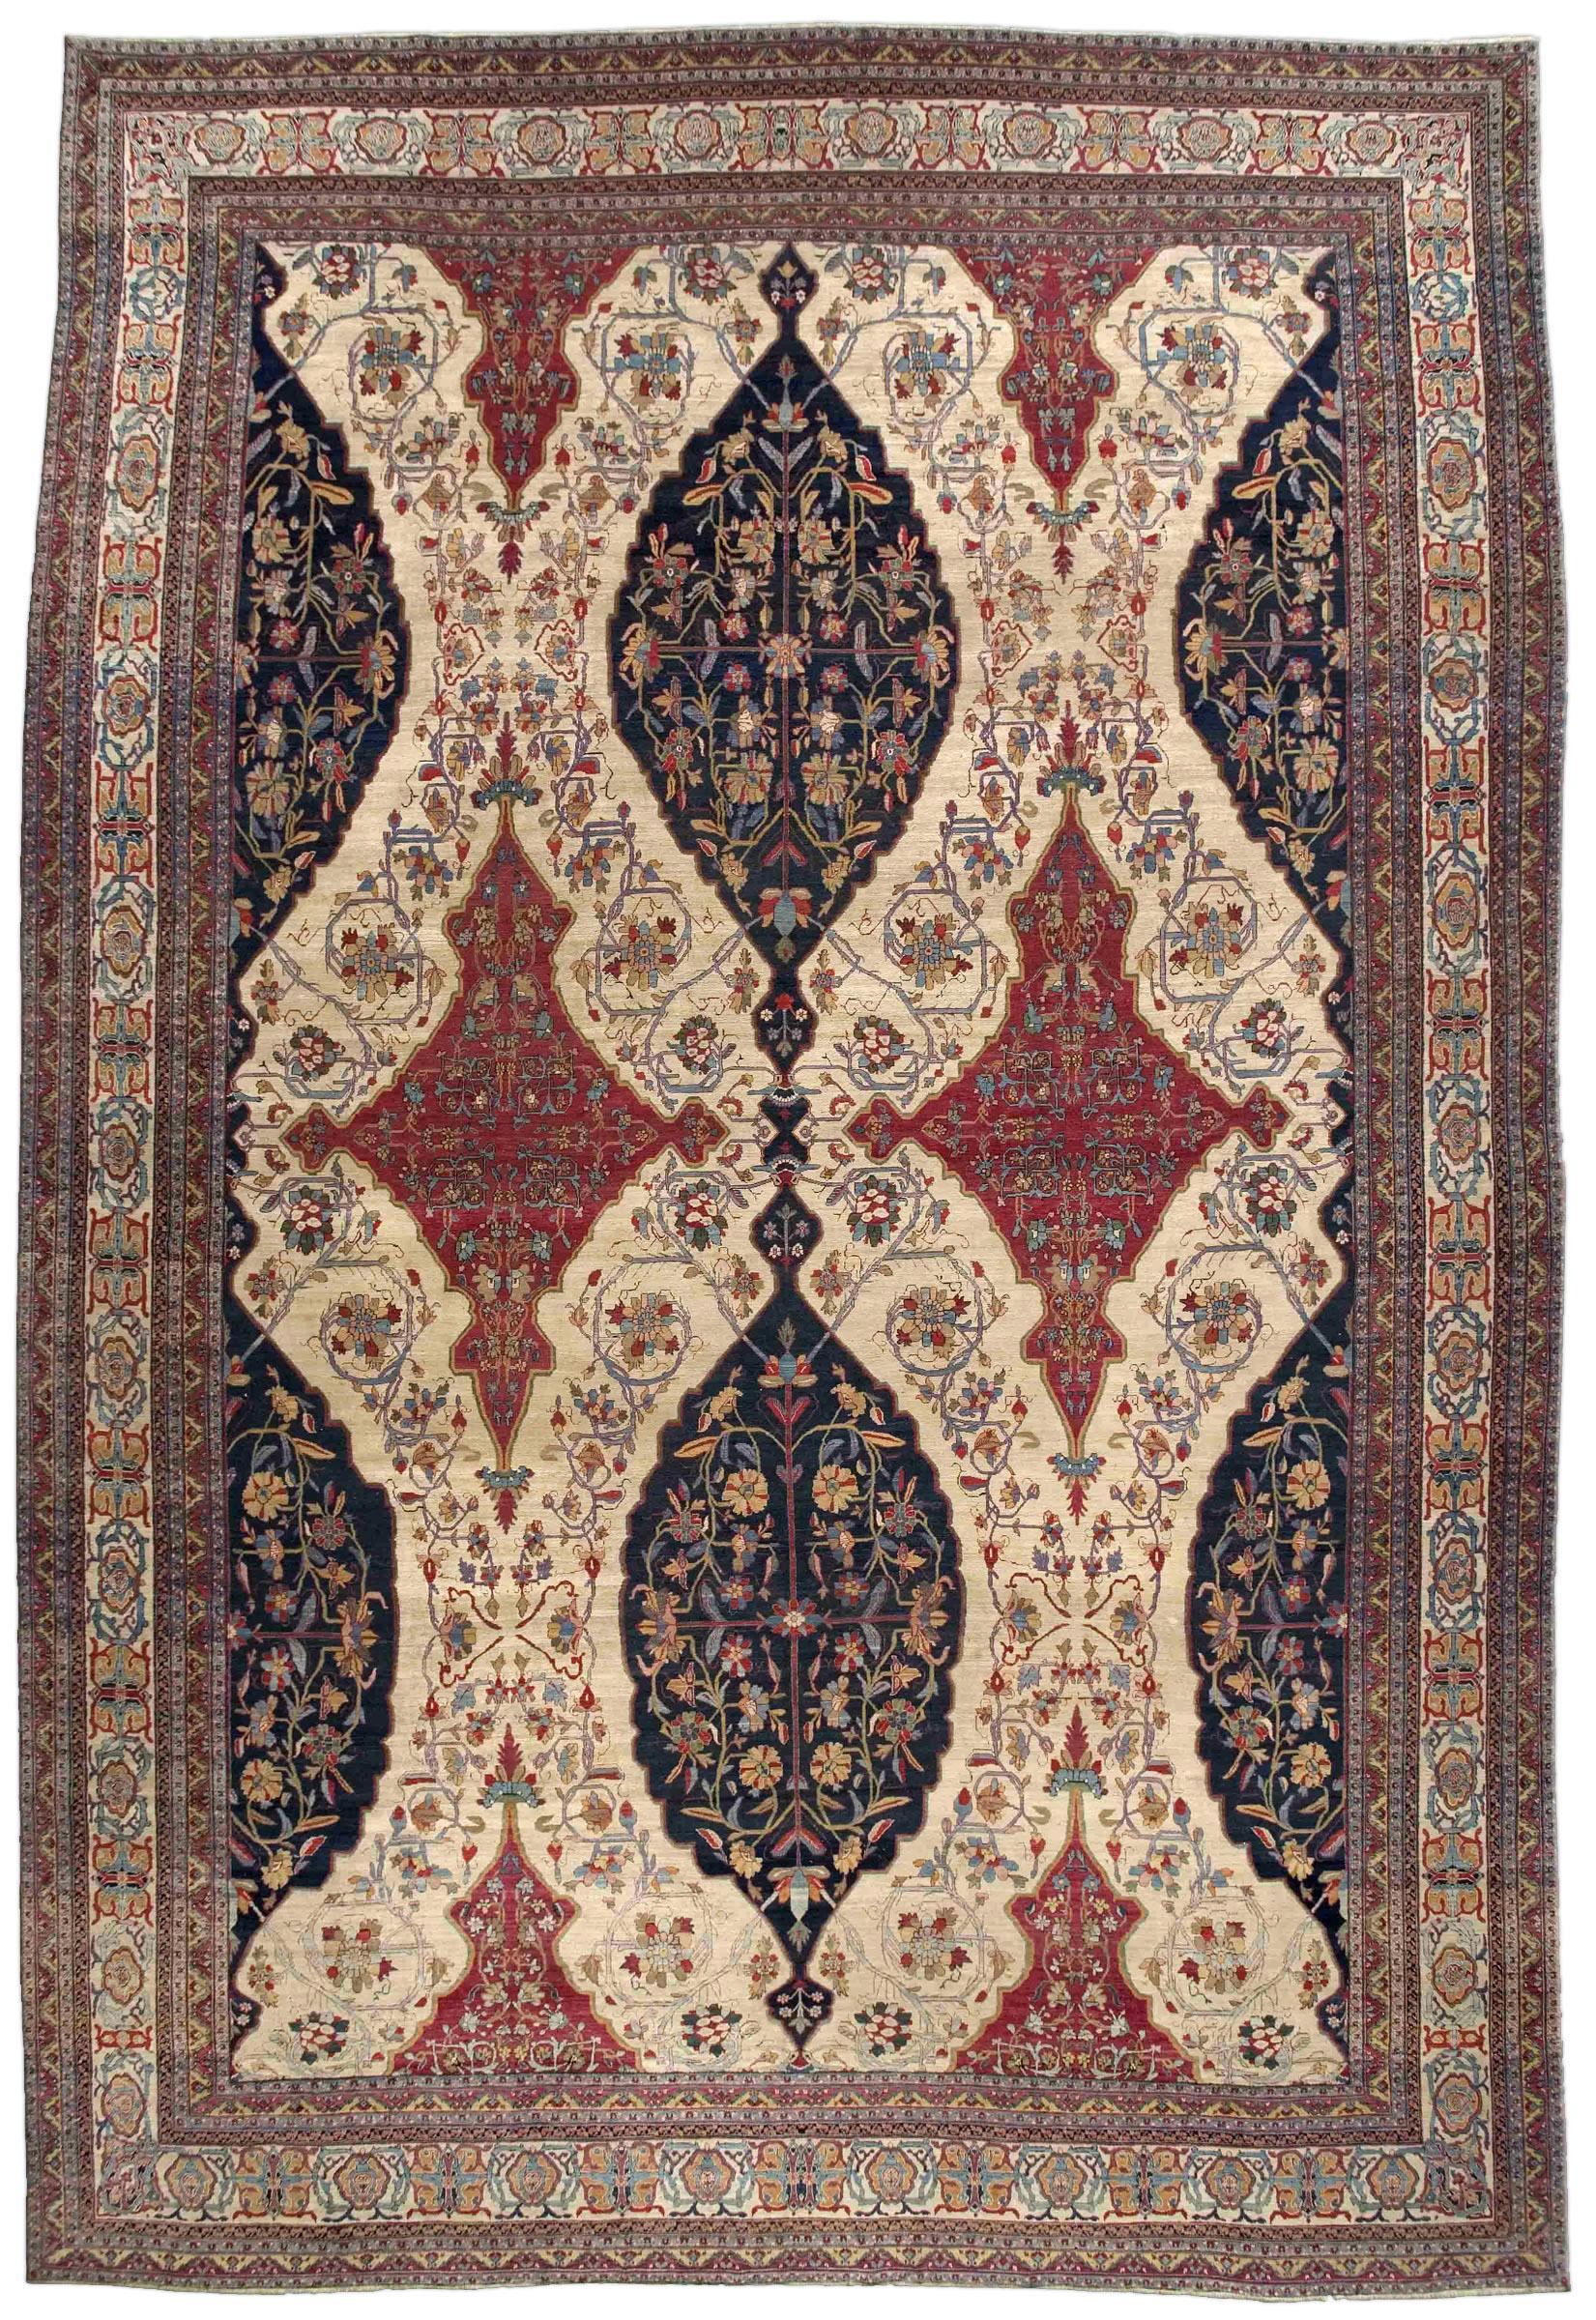 Oversized Antique Persian Kirman Rug